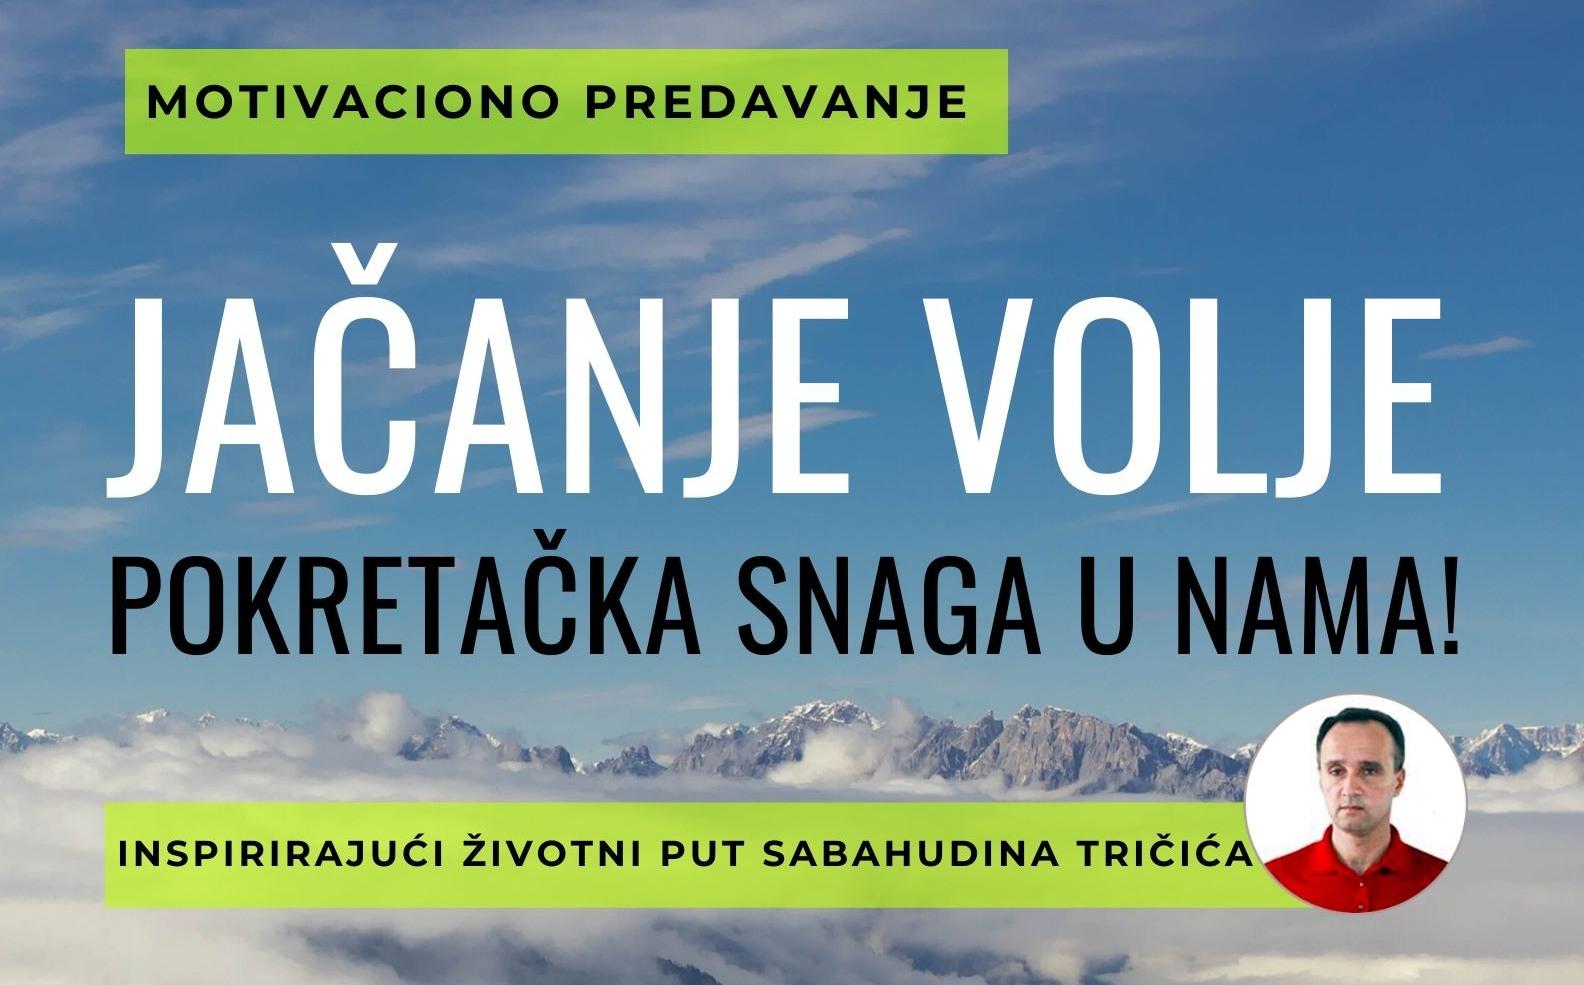 Plakat Sabahudin Tricic 16.12.2019 ver4. landacape